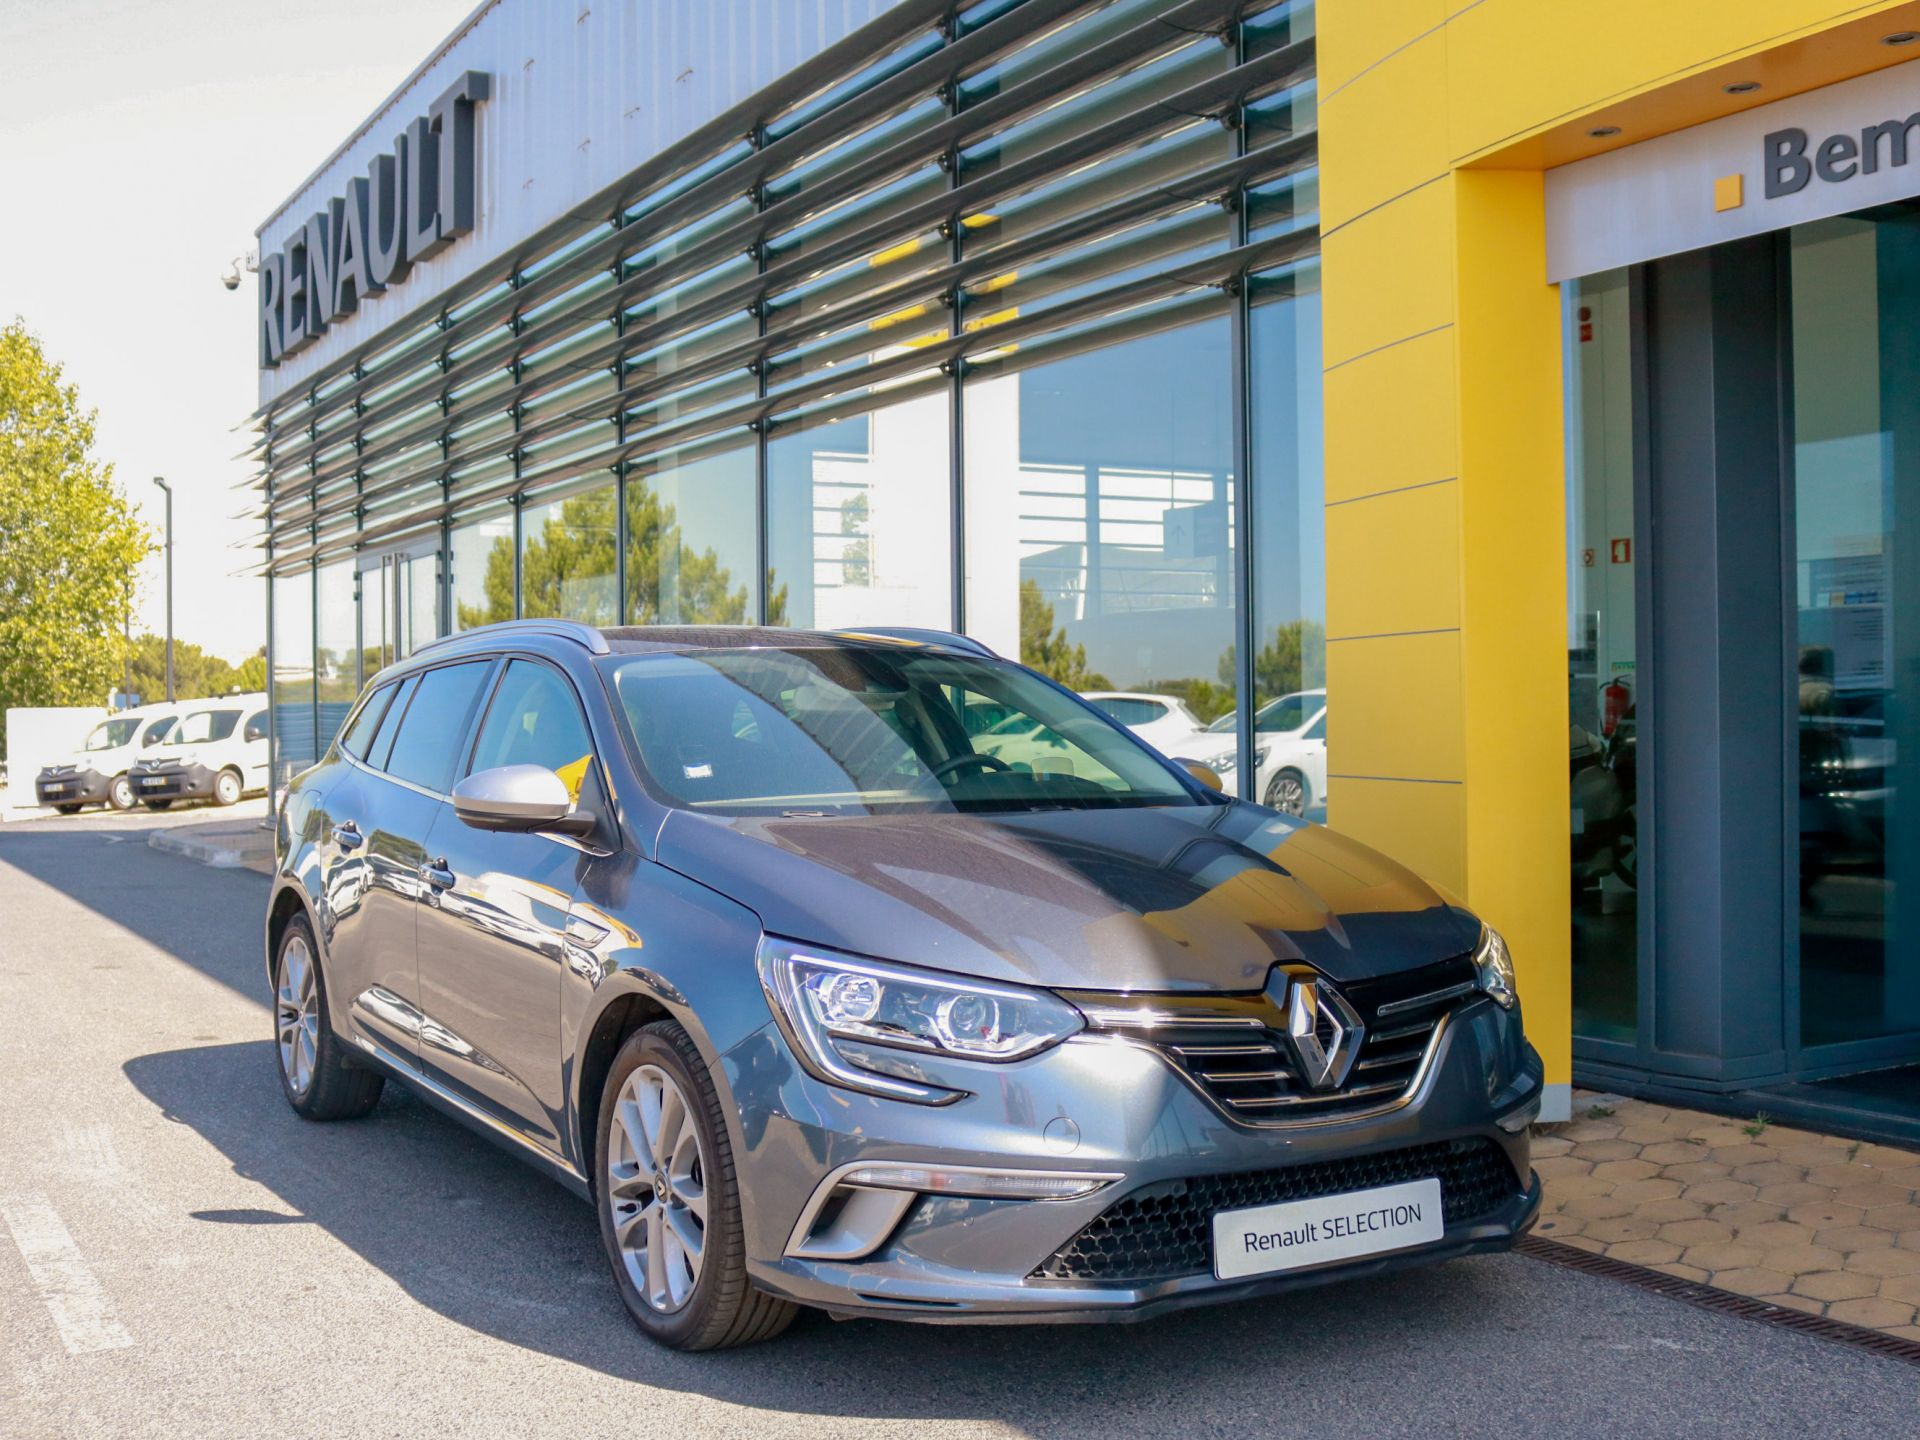 Renault Megane ST 1.5 Blue dCi 115cv GT Line segunda mão Setúbal